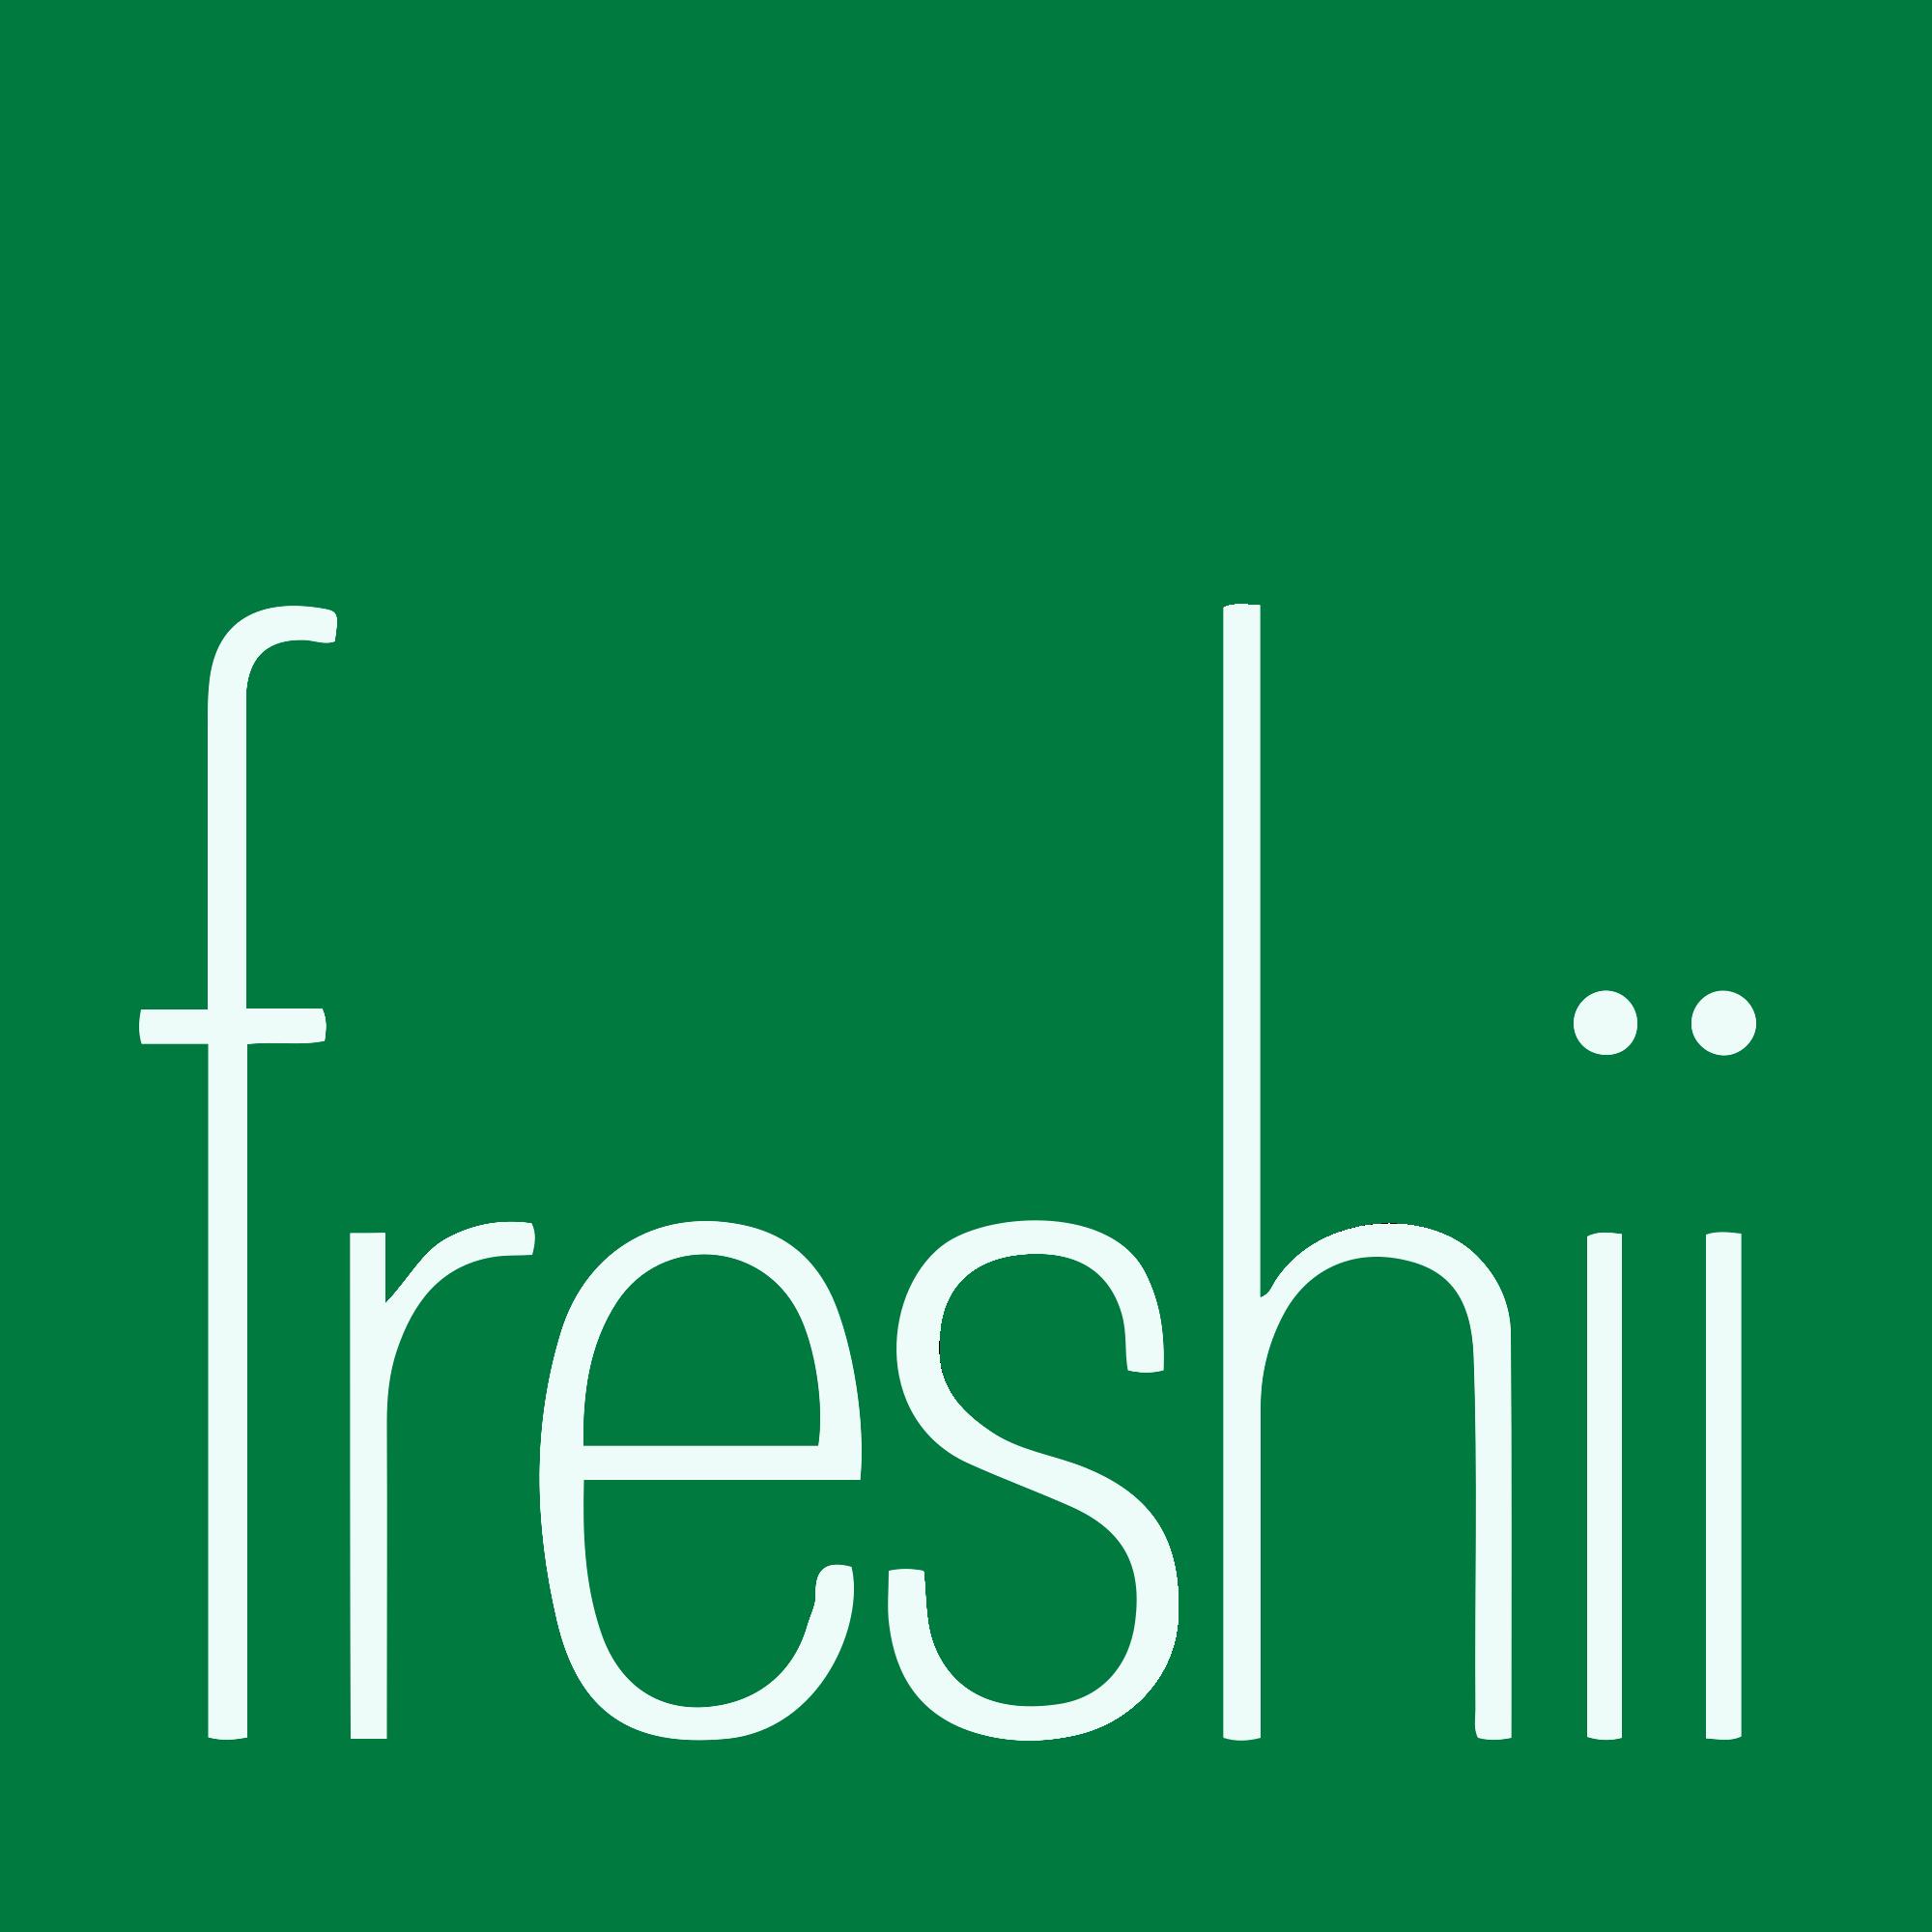 Freshii - Logo